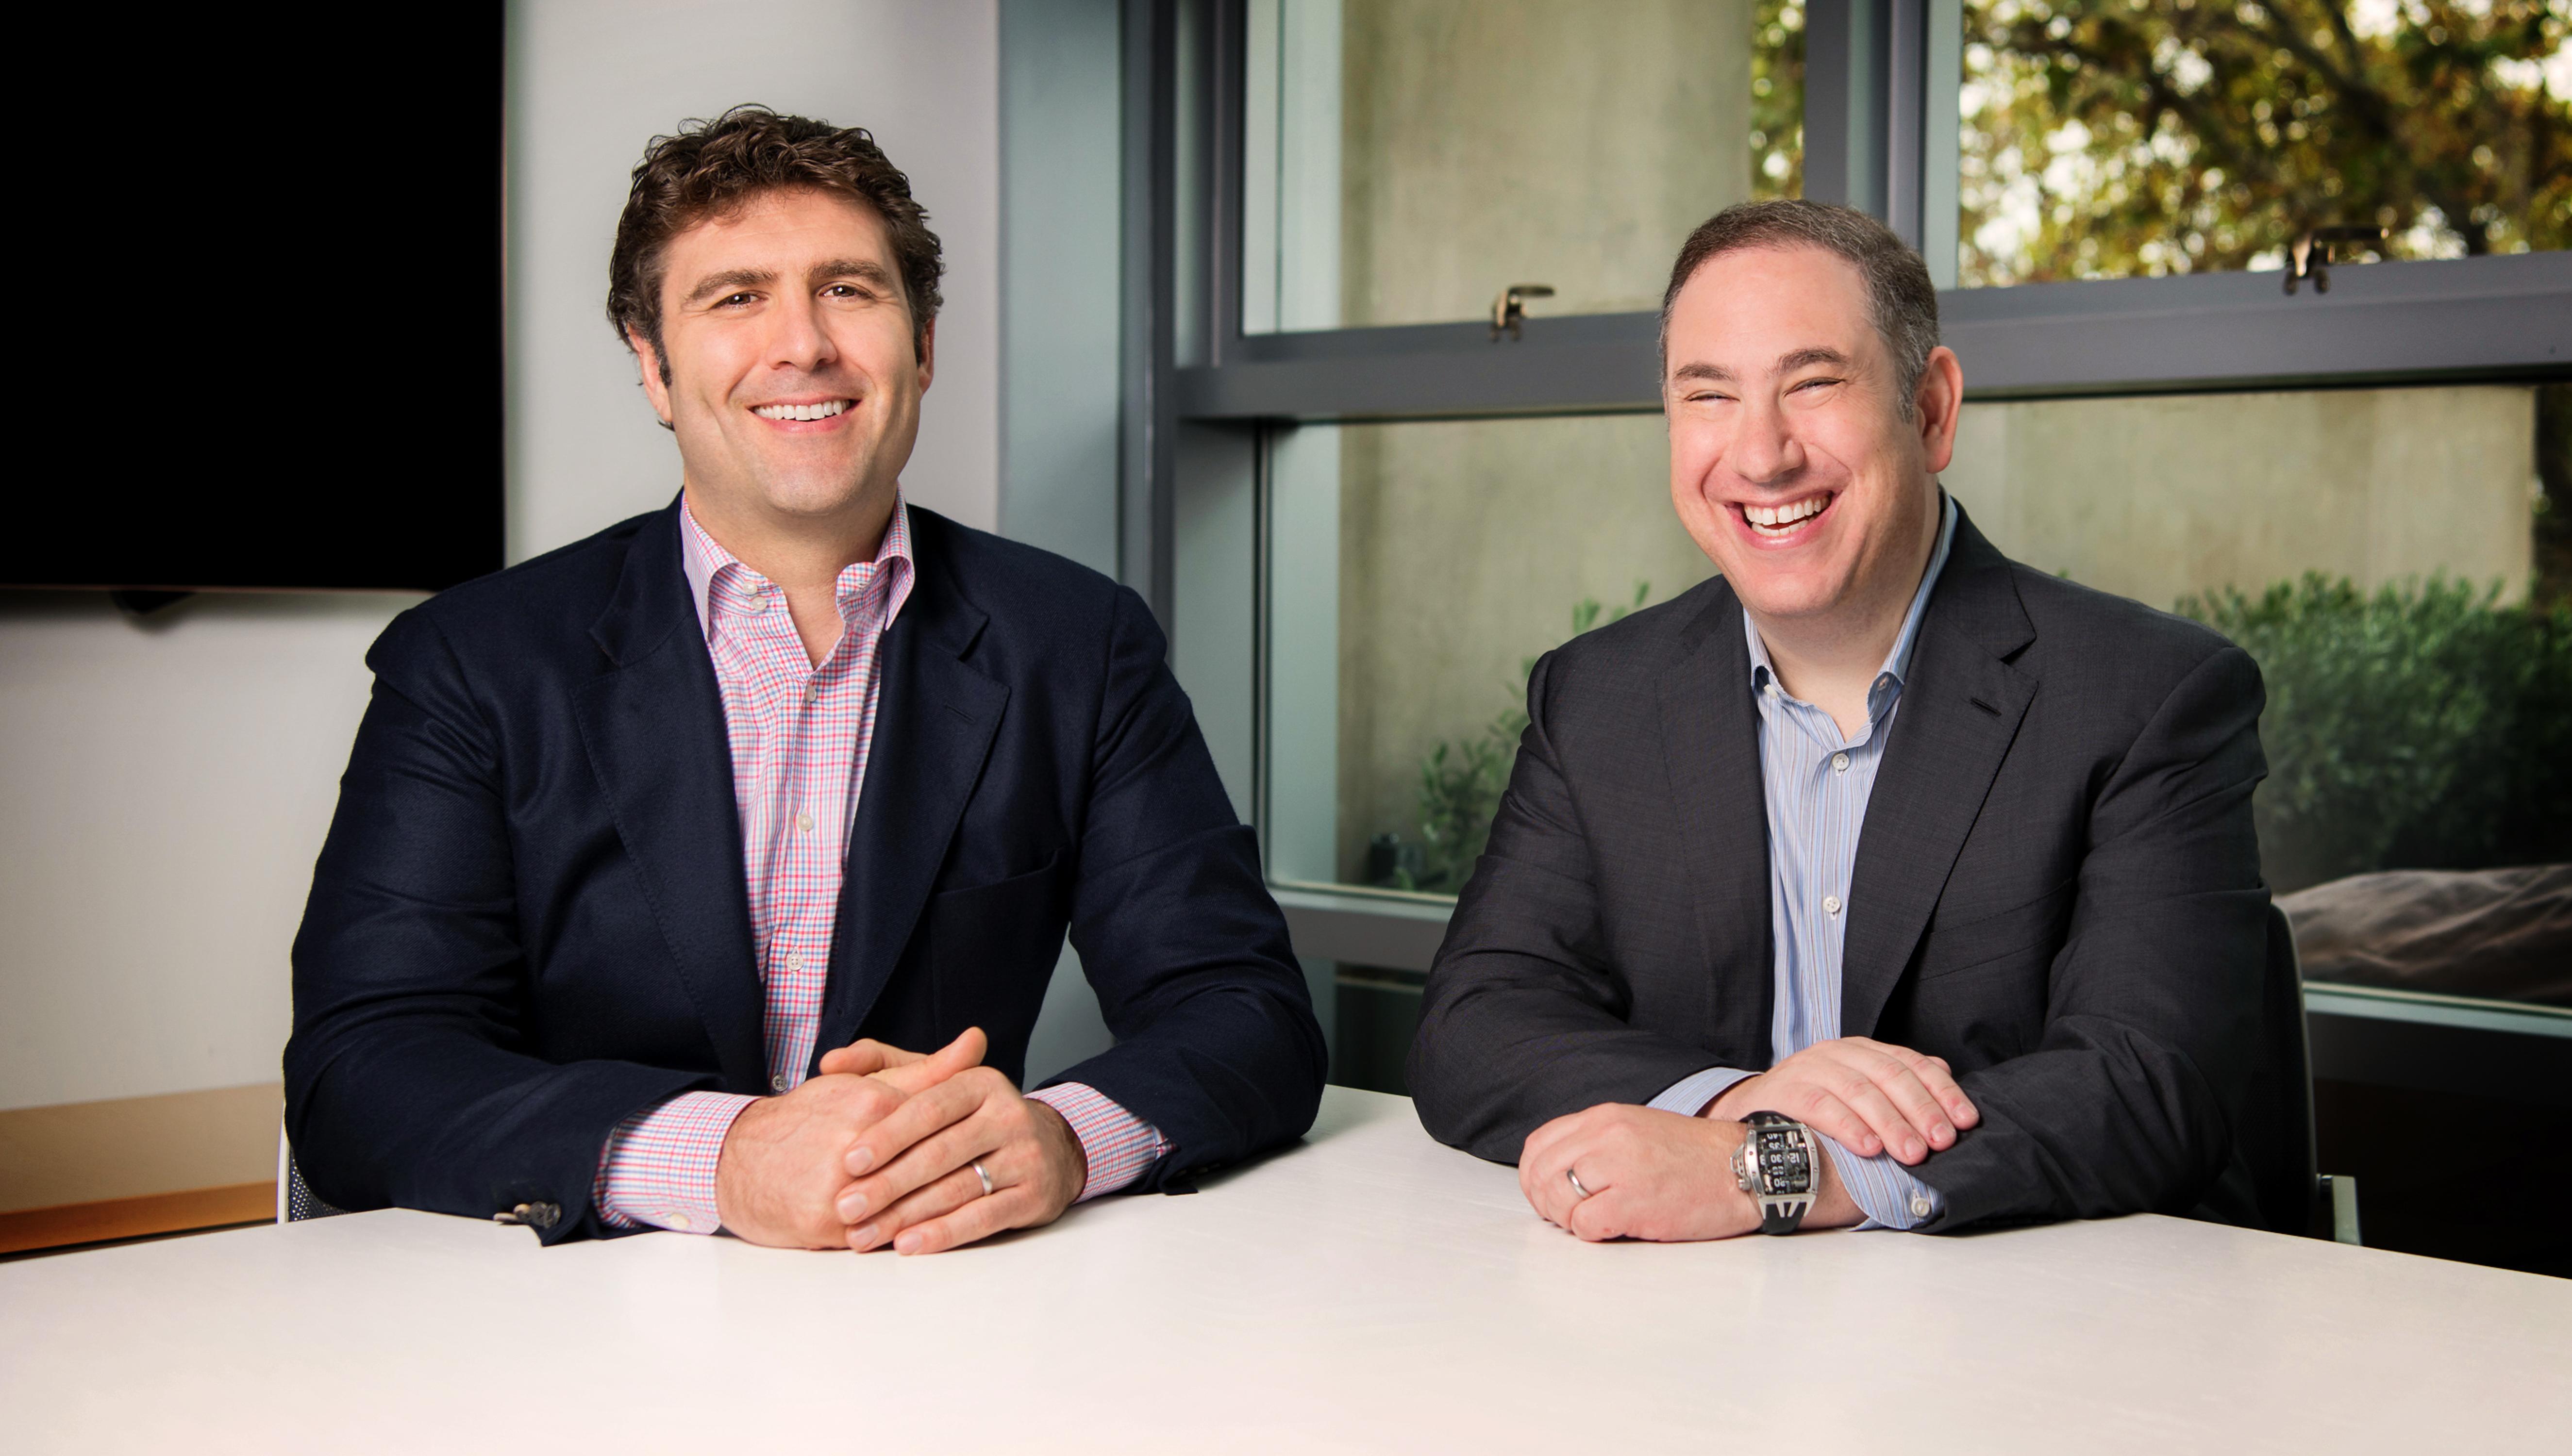 DCVC's managing partners Zack Bogue (left) and Matt Ocko (right)